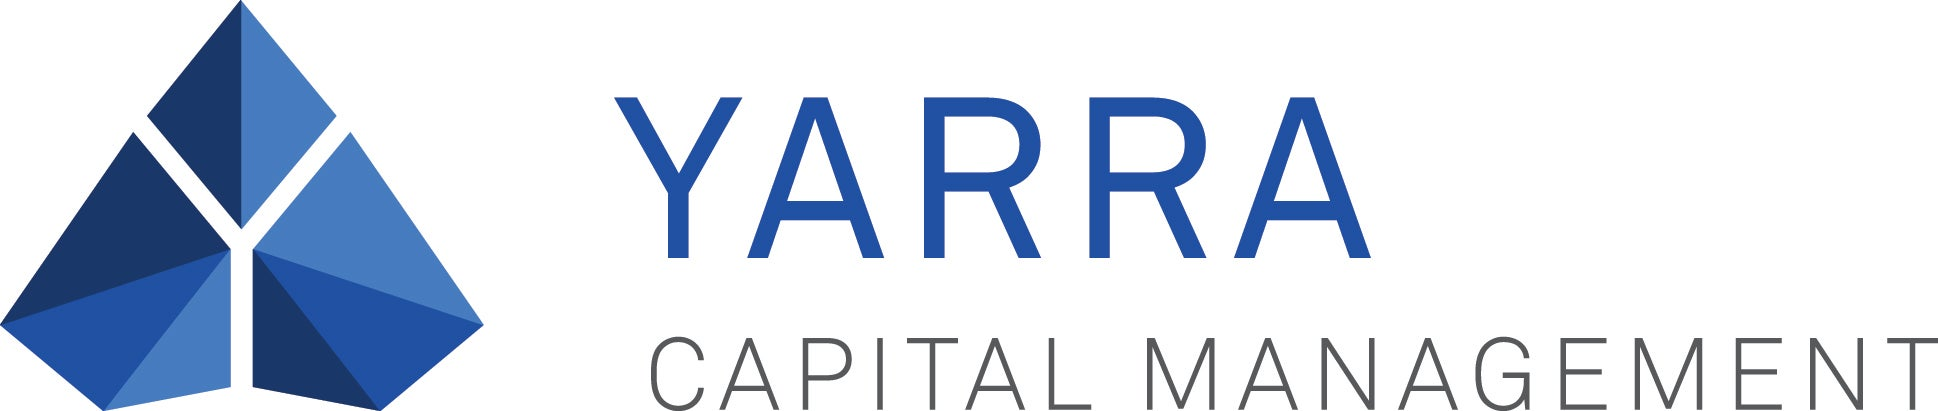 Logo of Yarra Capital Management